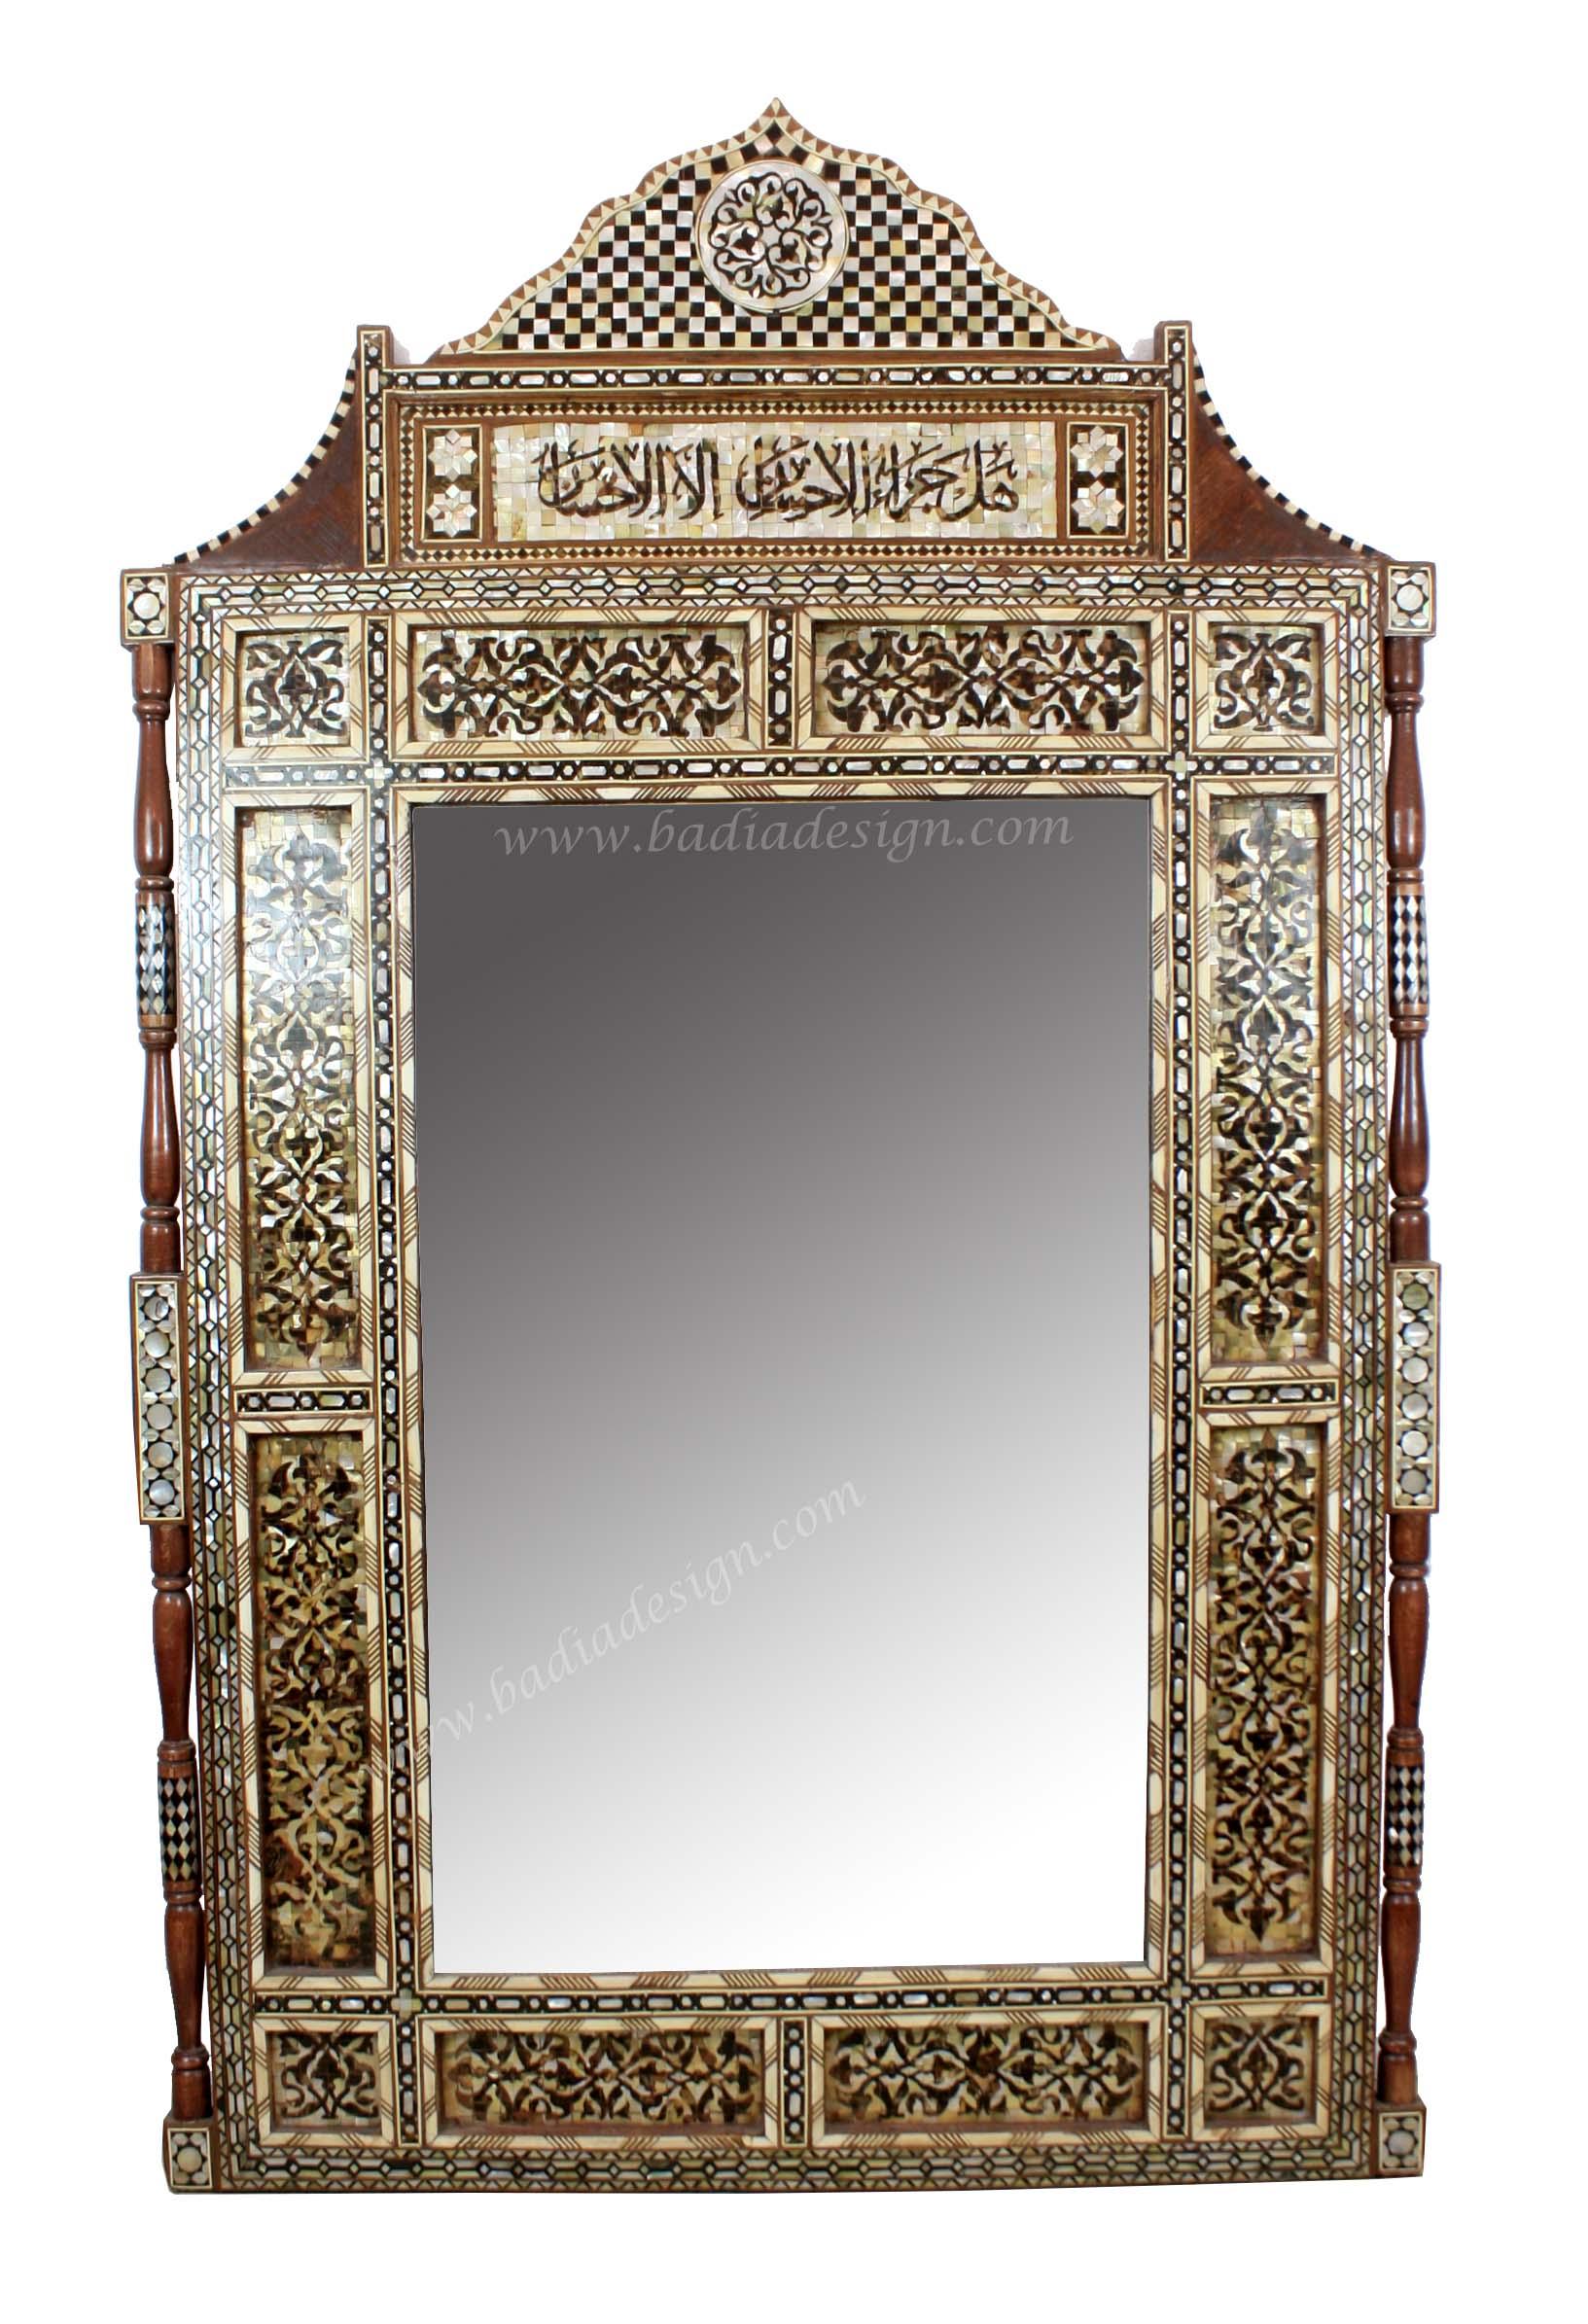 Great Moroccan Home Decor Ideas, Moroccan Home Decor, Indoor Furniture, Outdoor  Furniture, Moroccan